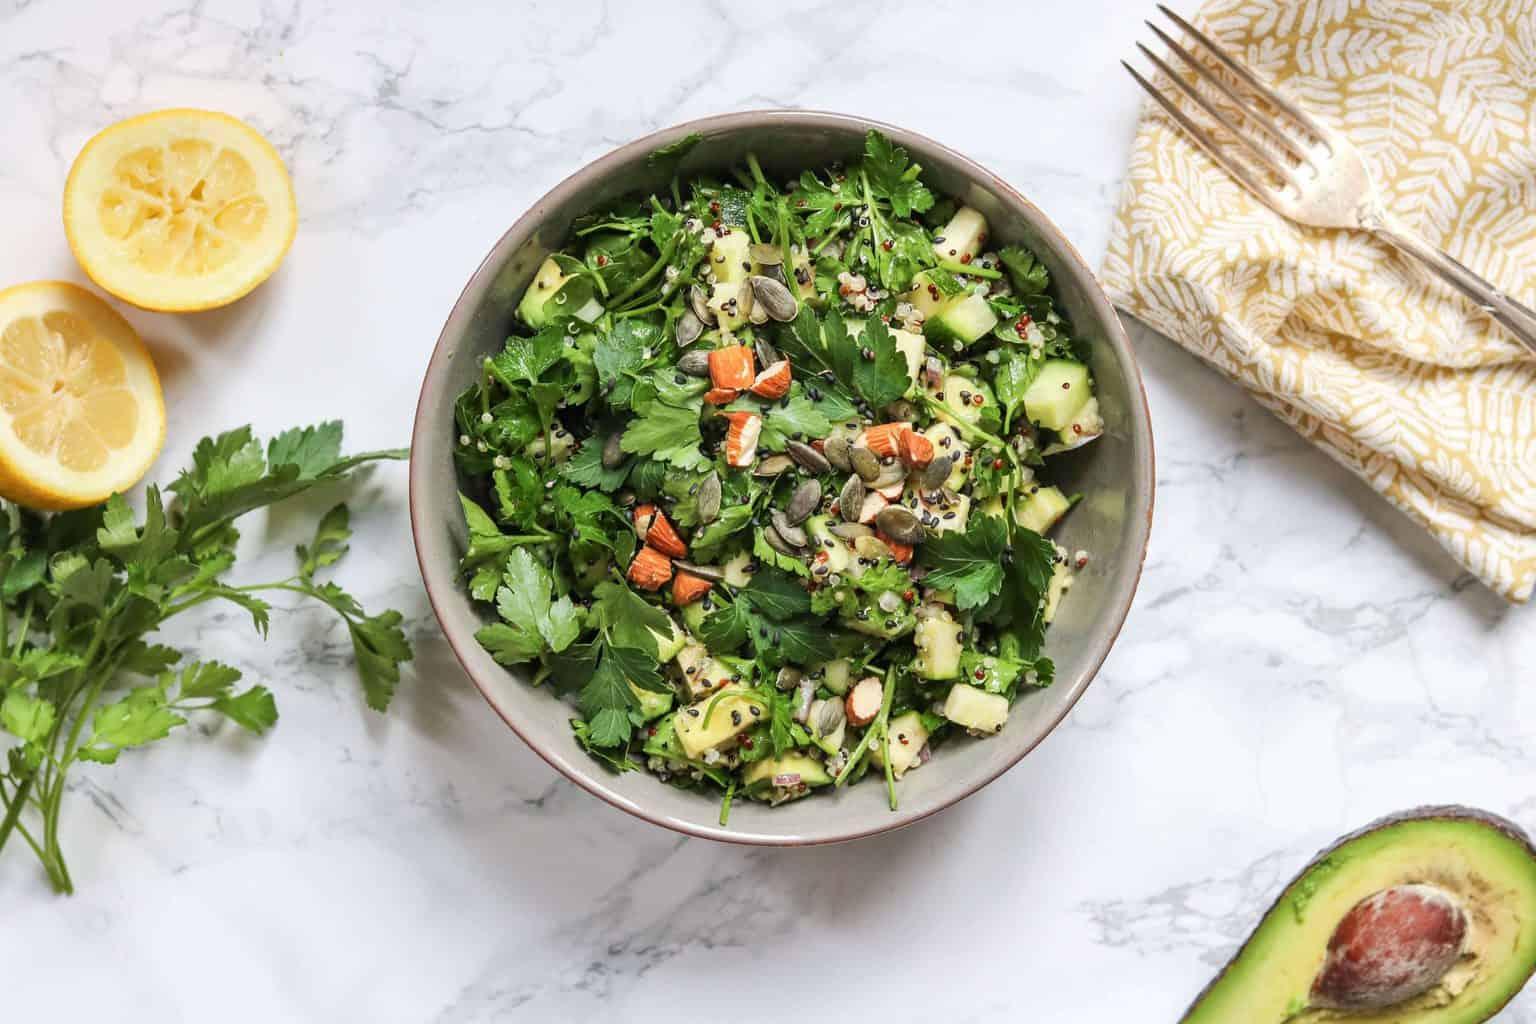 detox salad 1 1 scaled - Contact